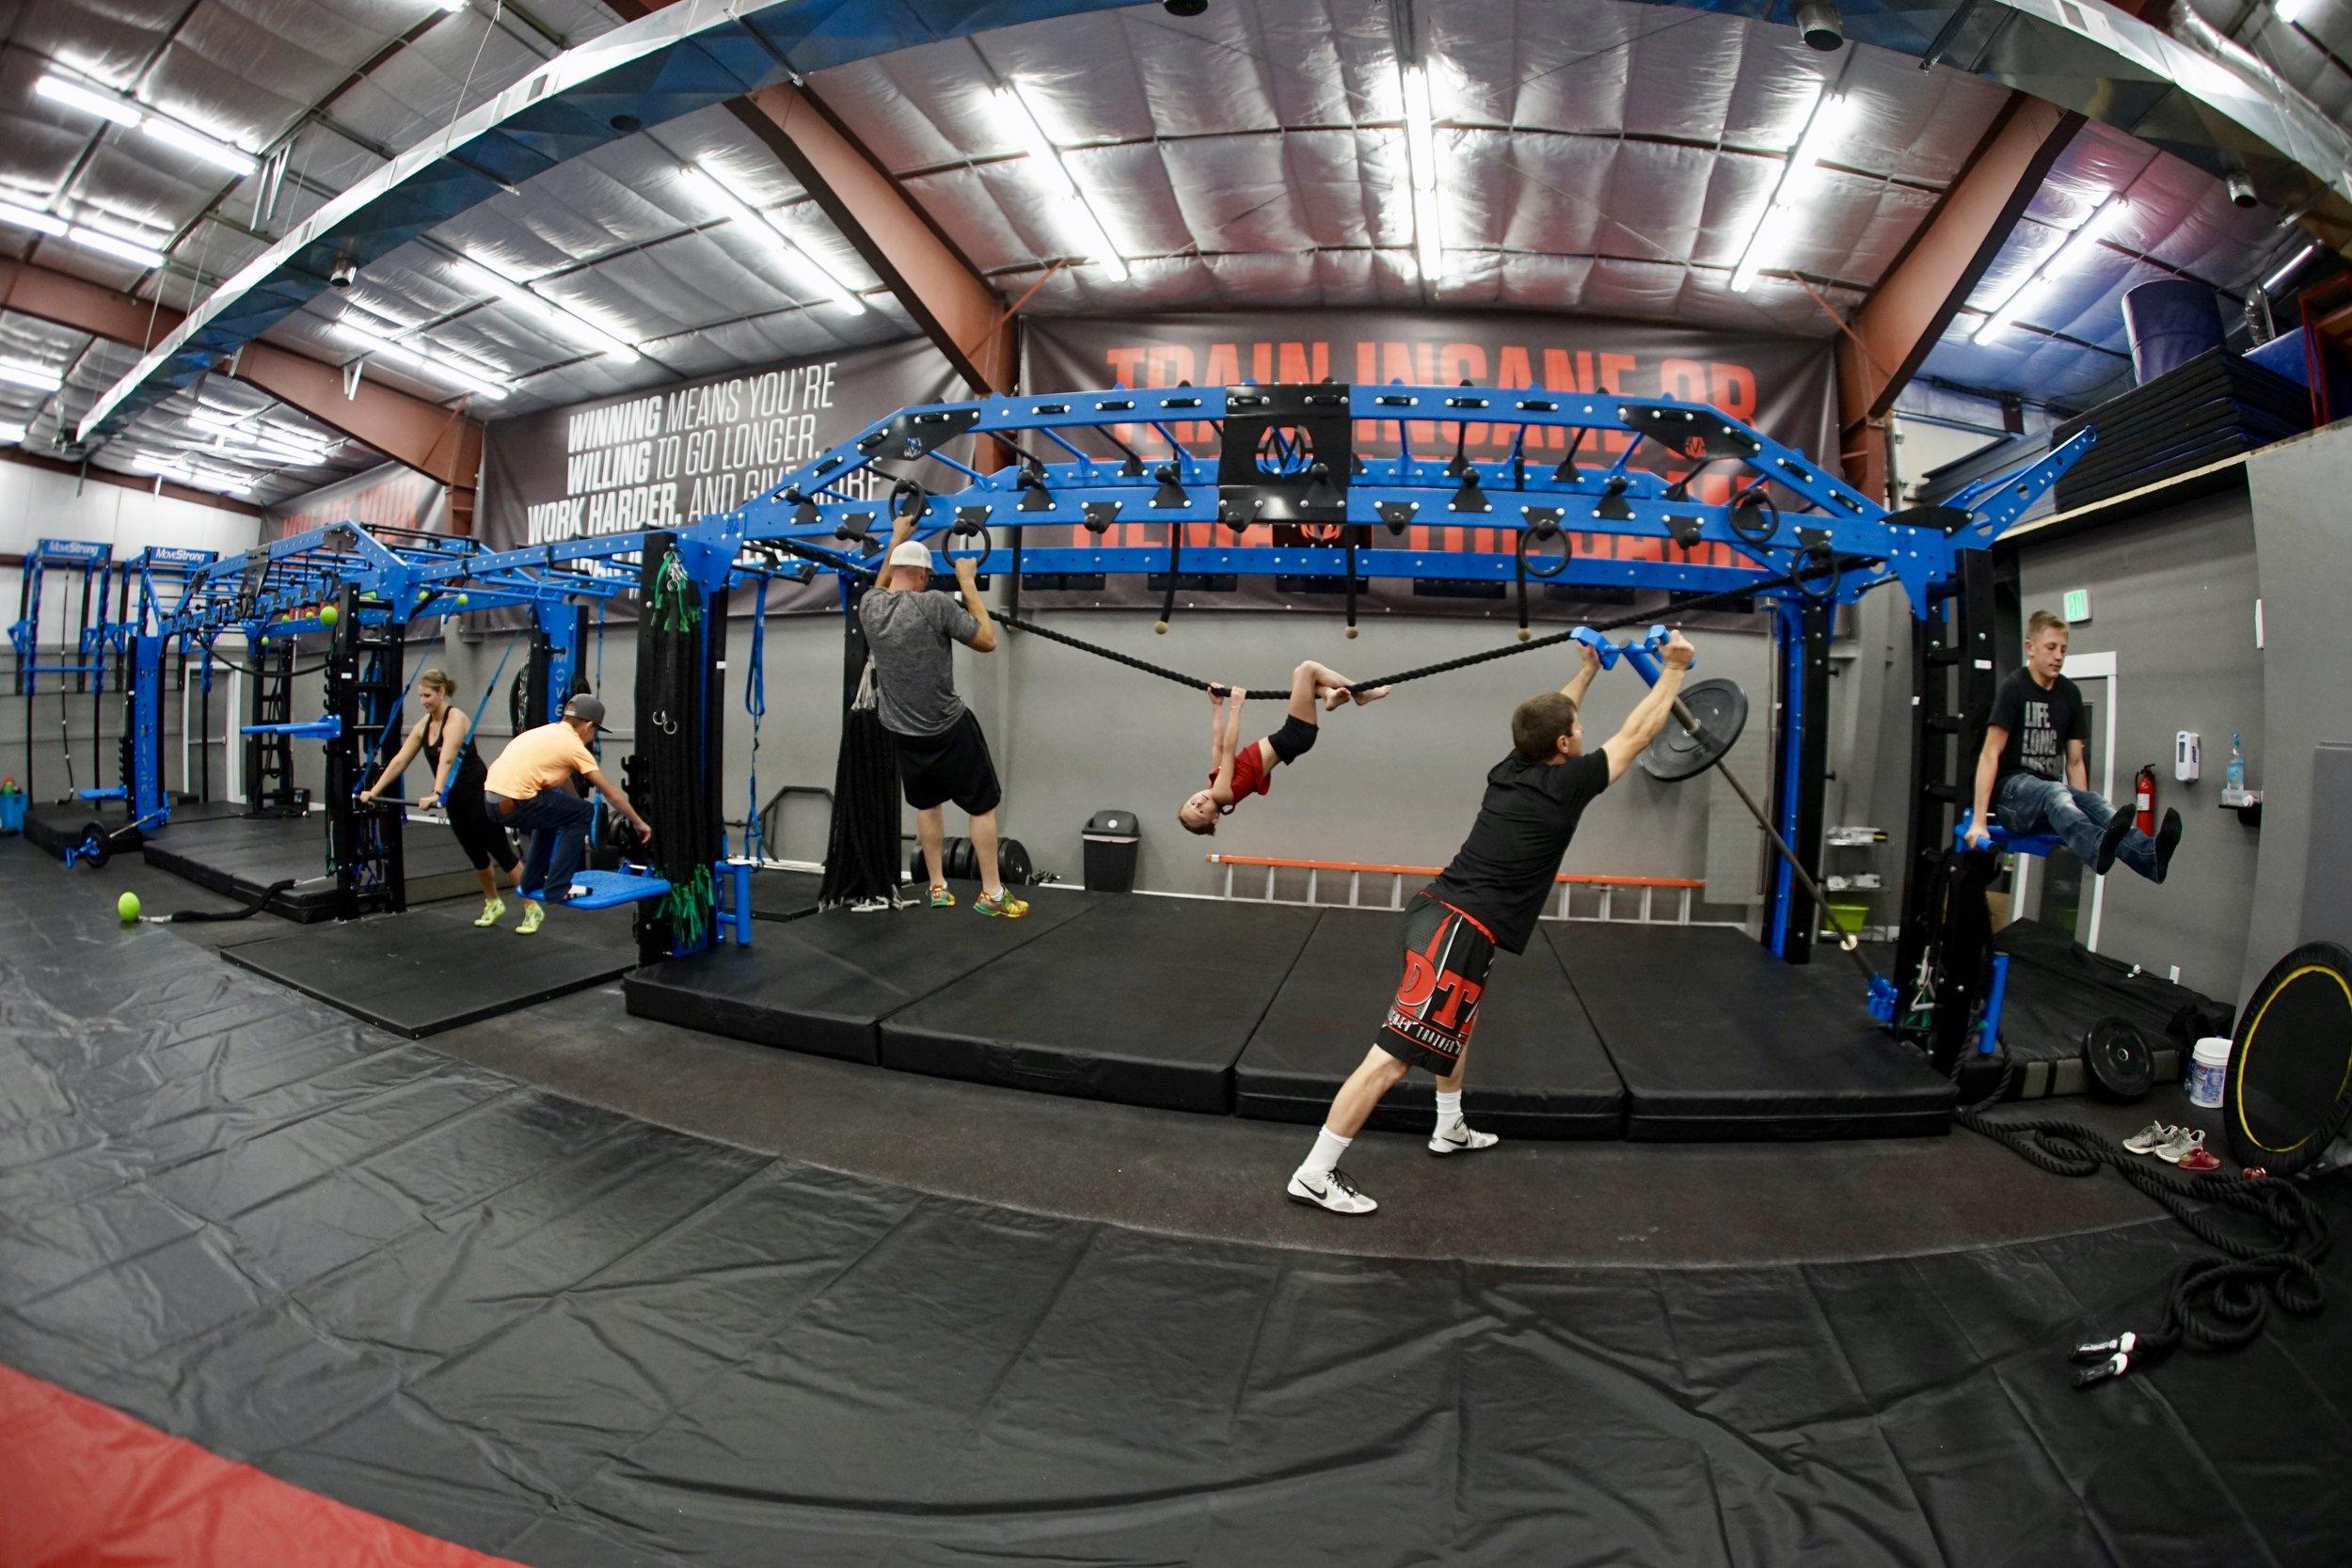 Team sport fitness training